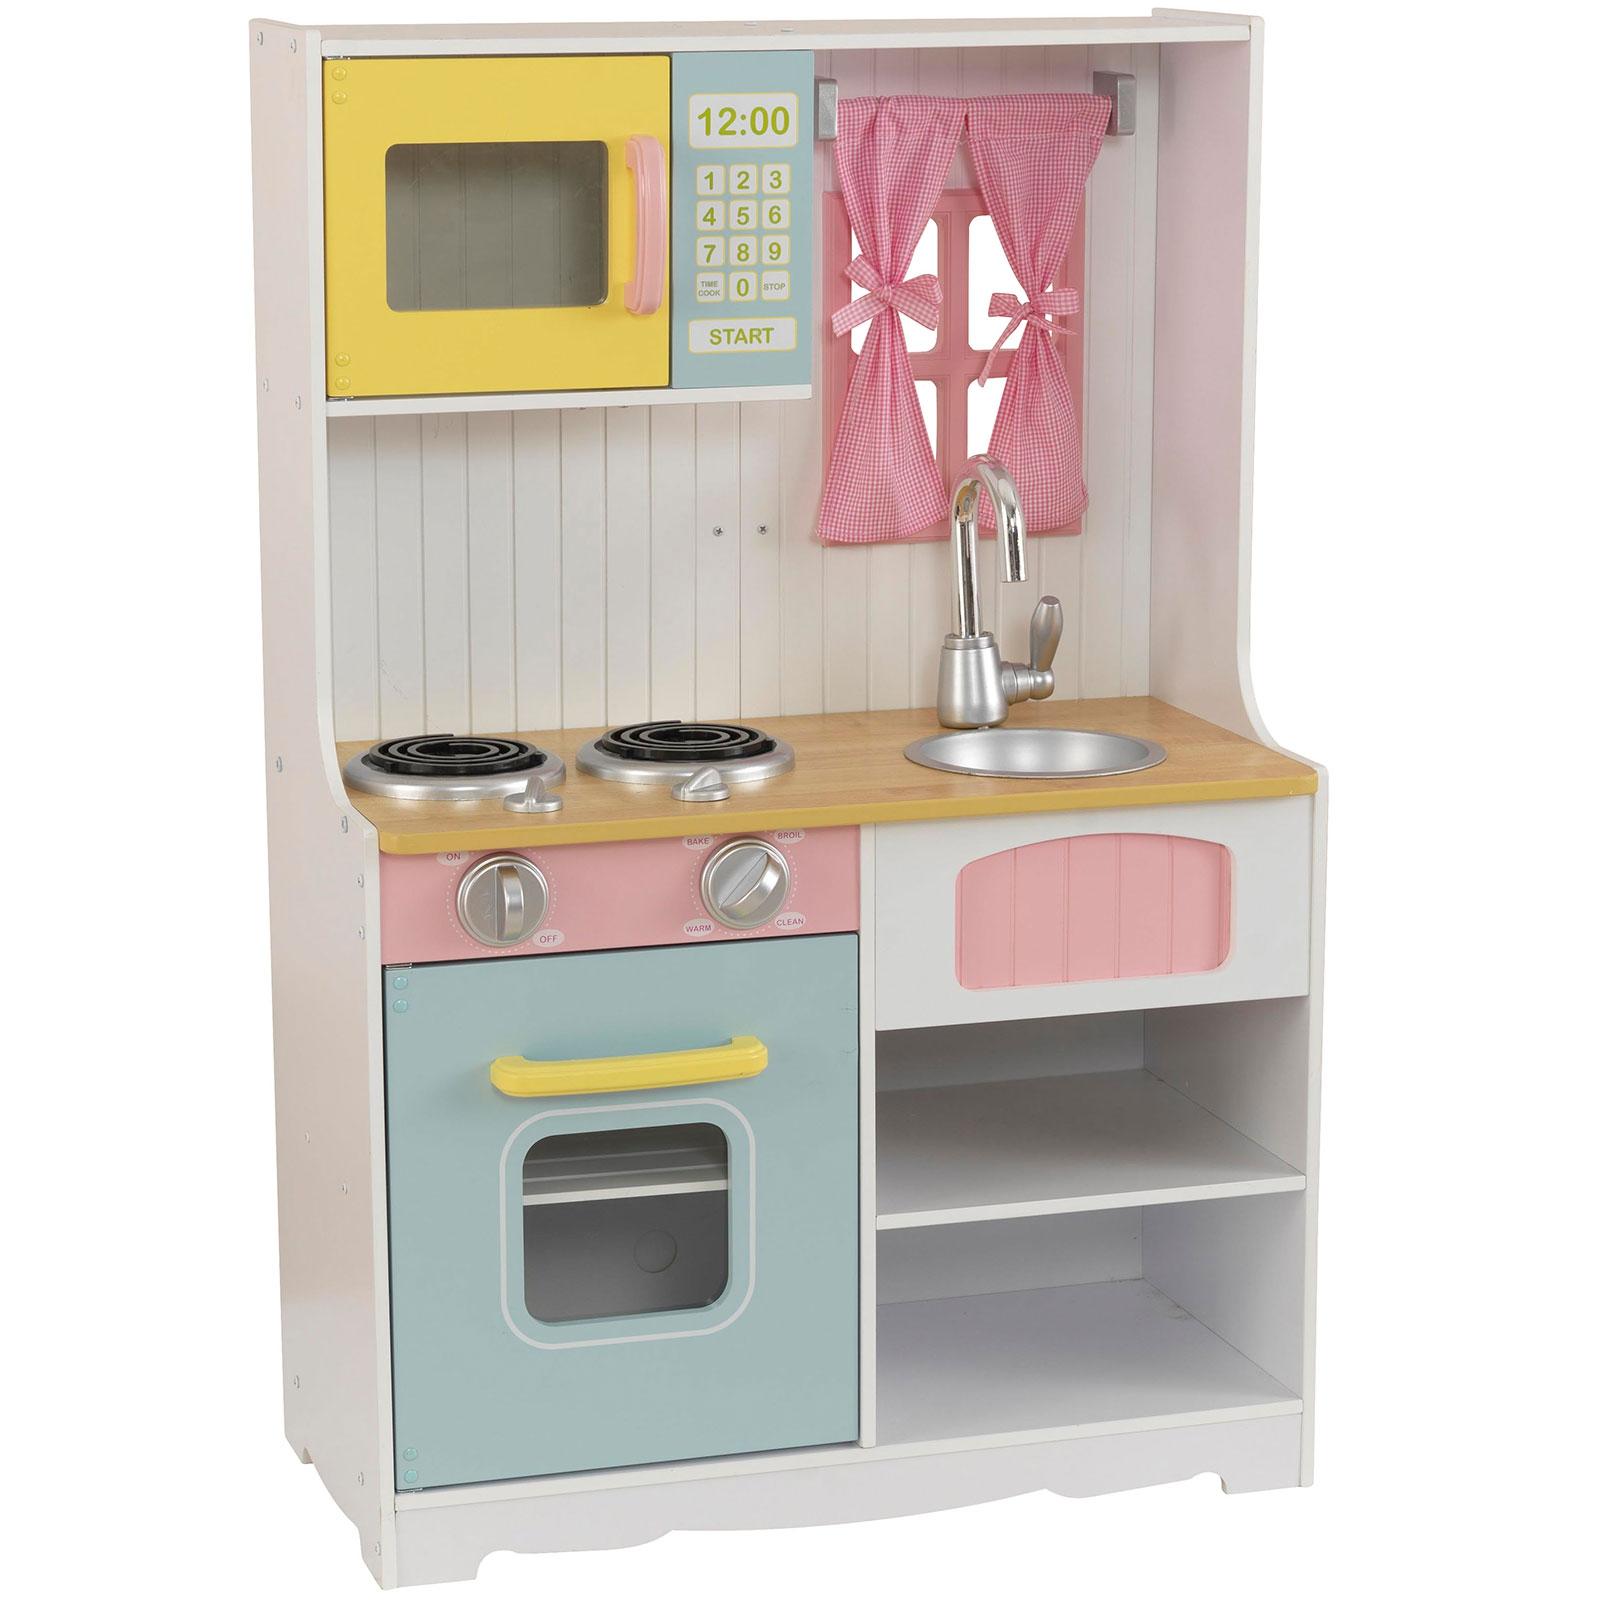 cuisine kidkraft pas cher cuisine moderne marocaine bois u bordeaux with cuisine kidkraft pas. Black Bedroom Furniture Sets. Home Design Ideas